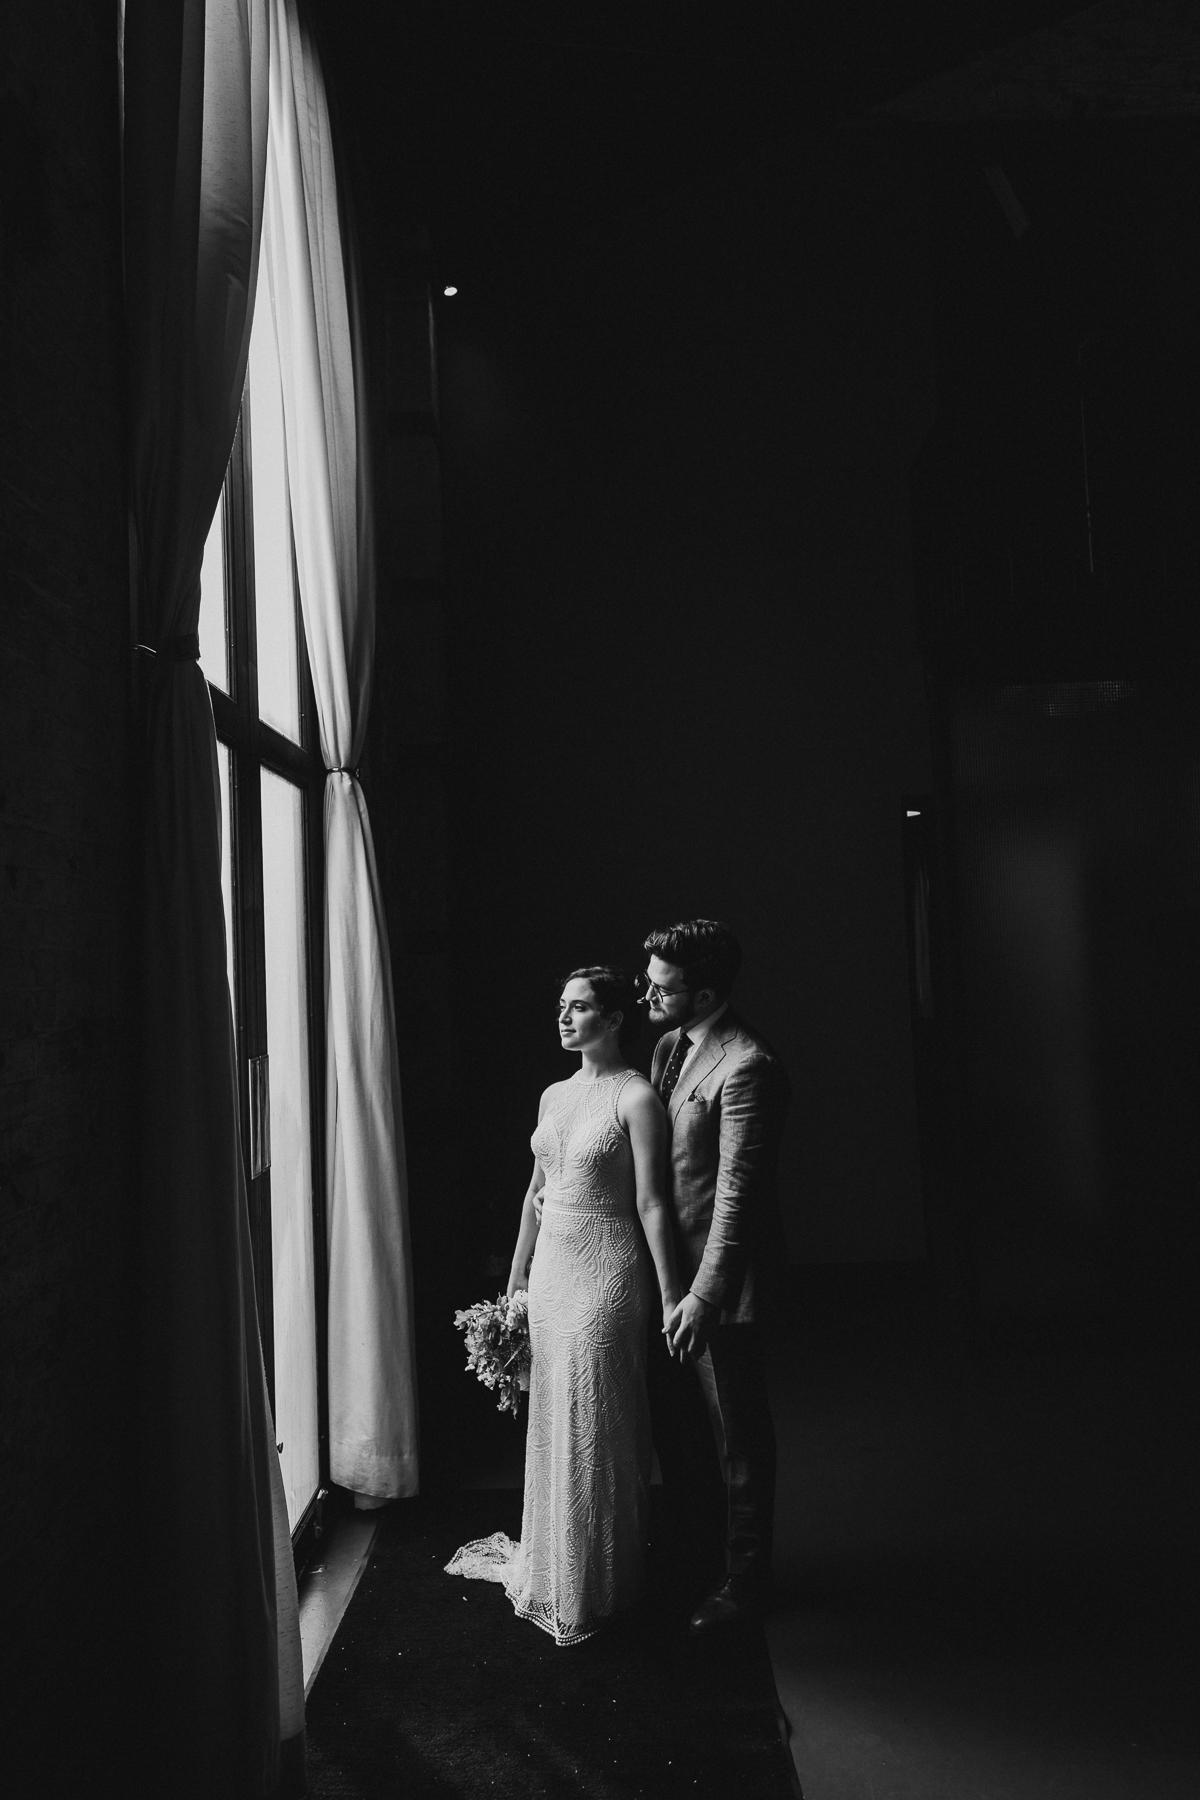 The-Green-Building-Jewish-Wedding-NYC-Brooklyn-Documentary-Wedding-Photographer-14.jpg